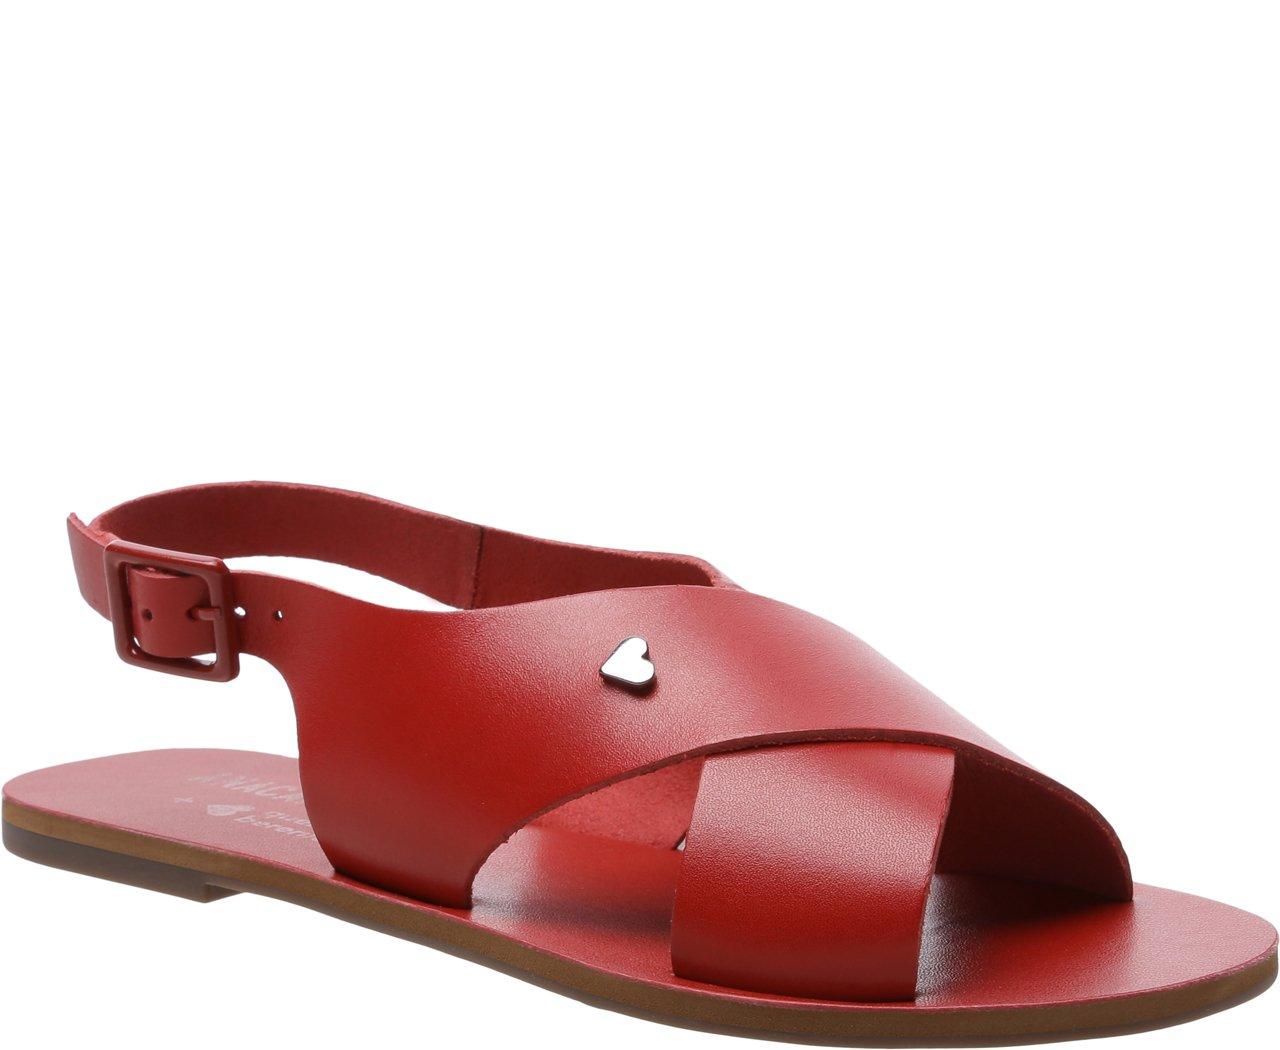 Sandália Tiras Cruzadas Collab Qdb Vermelha | Anacapri